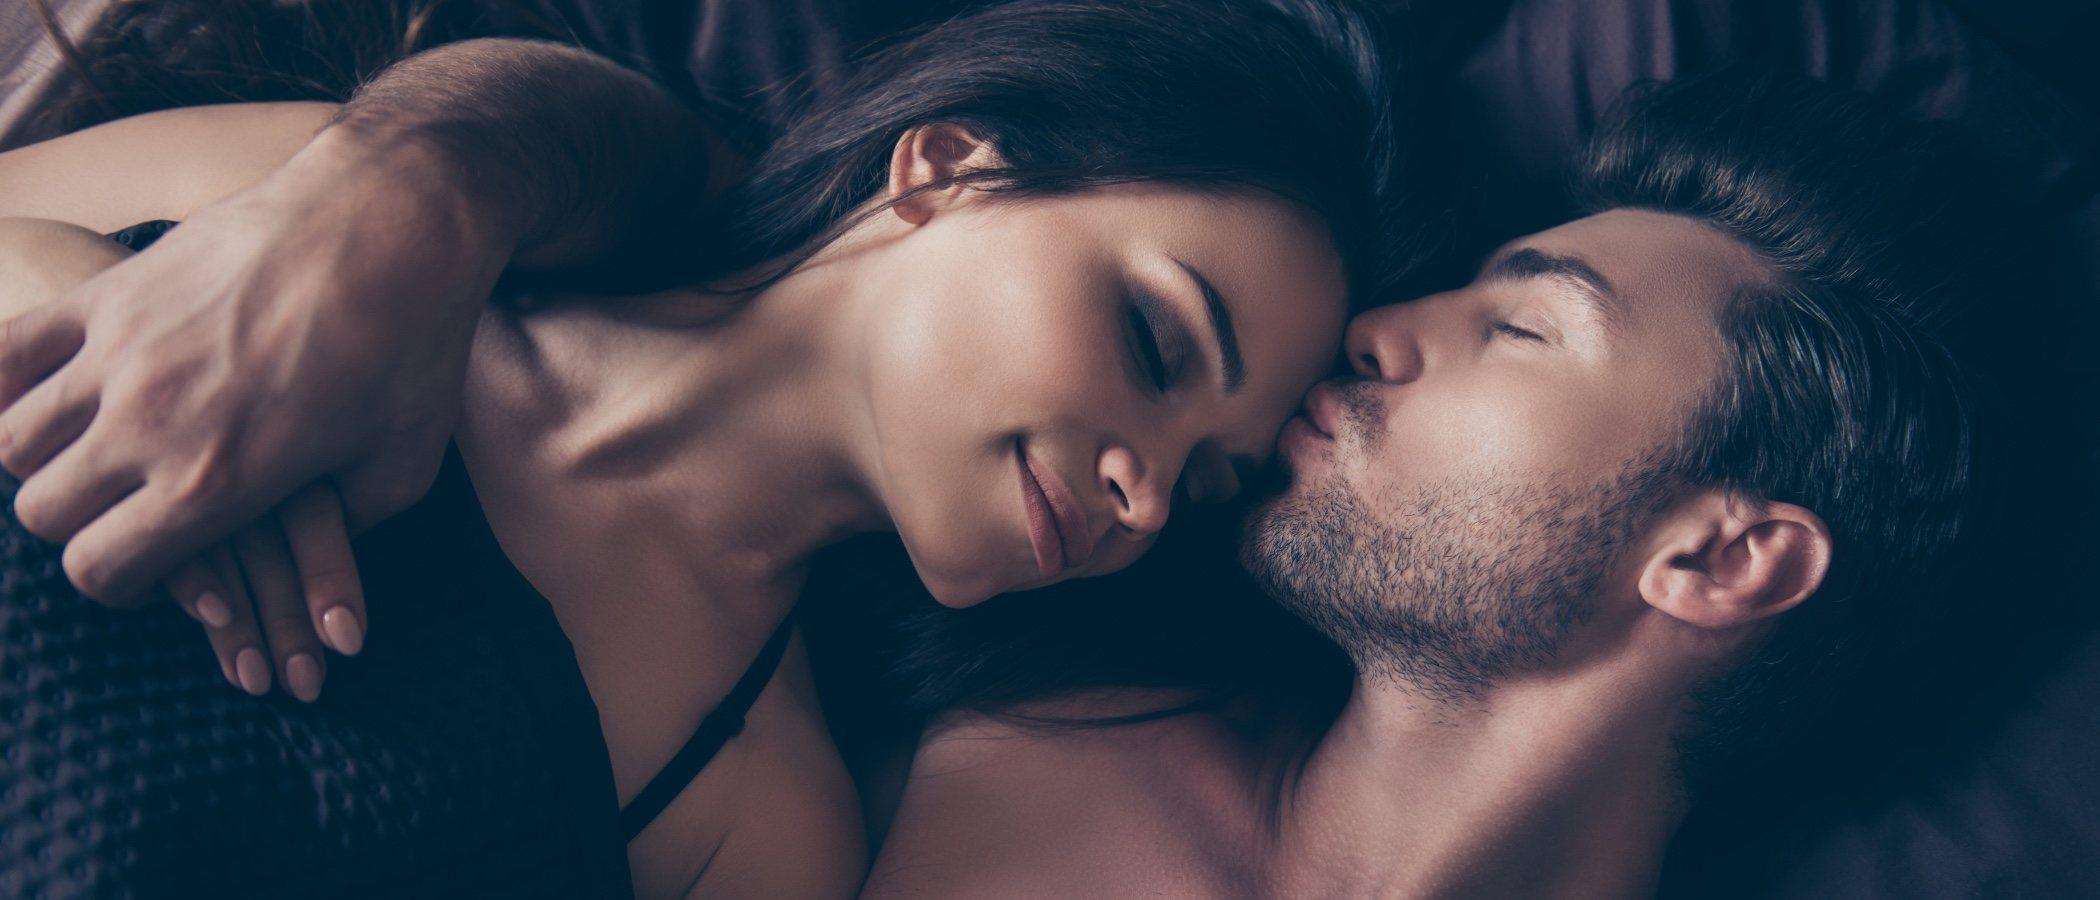 Horóscopo sexual marzo 2020: Capricornio